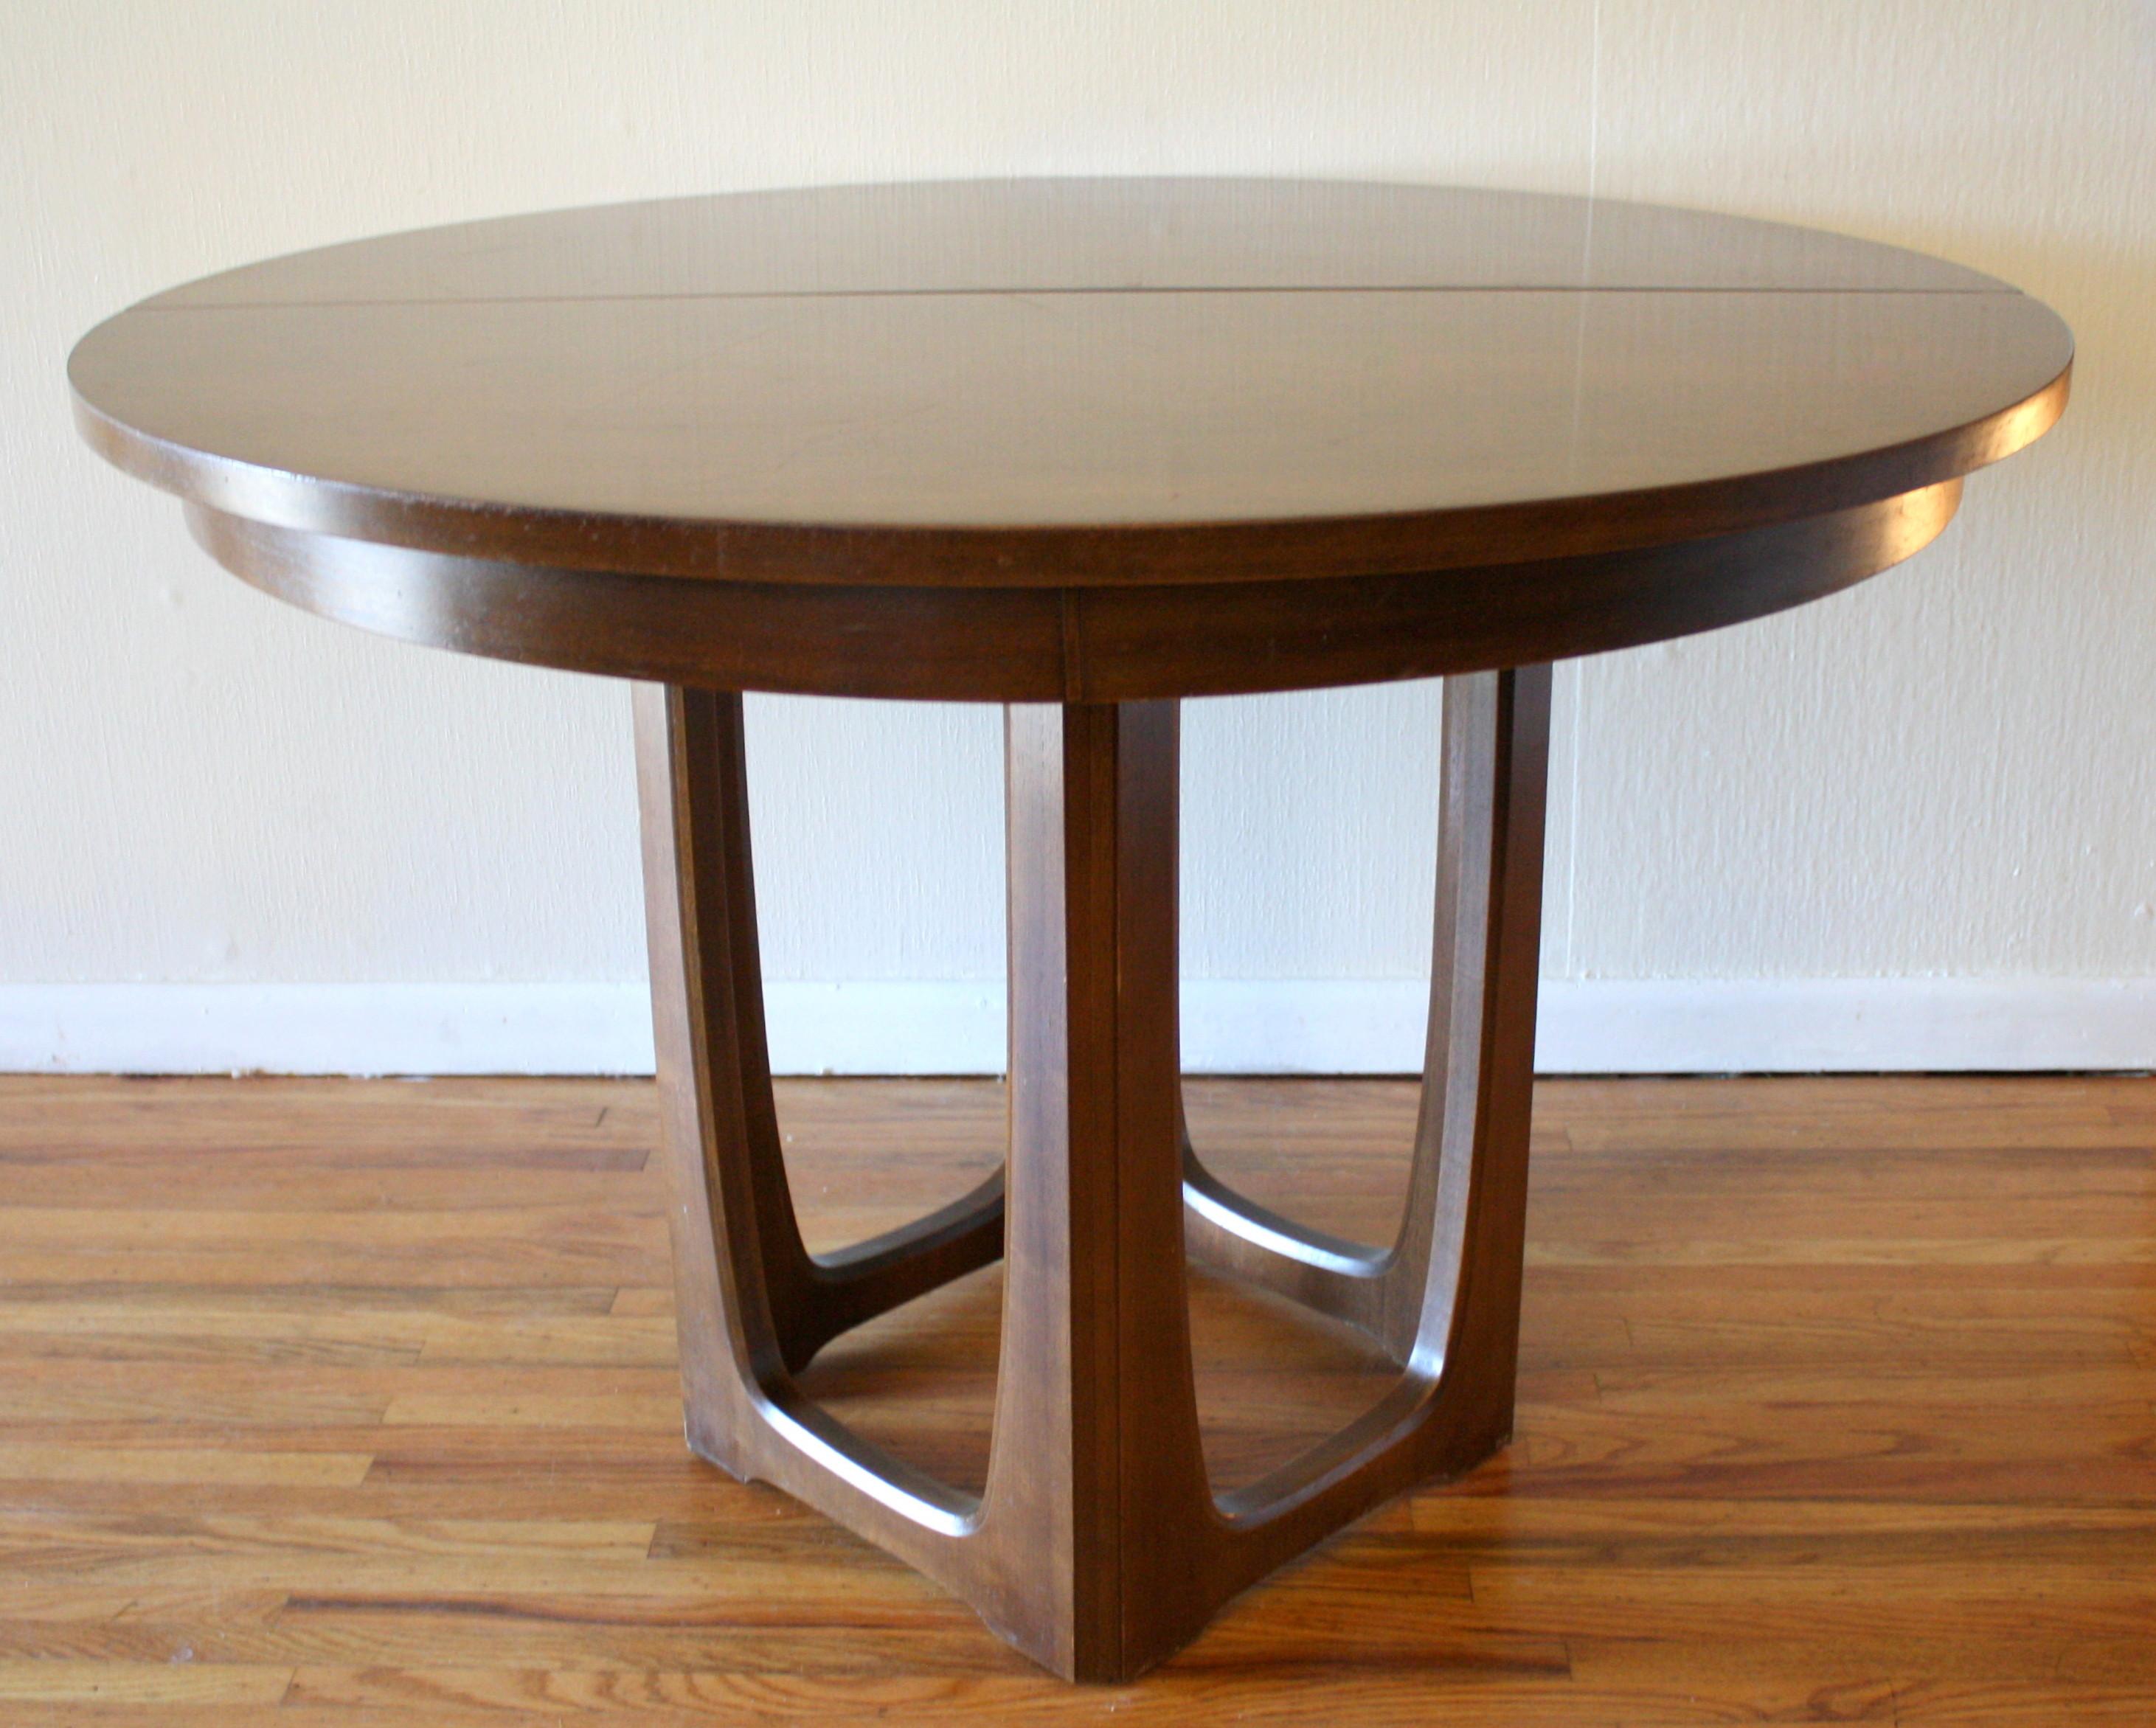 Best ideas about Mid Century Modern Dining Table . Save or Pin Mid Century Modern Dining Tables Now.